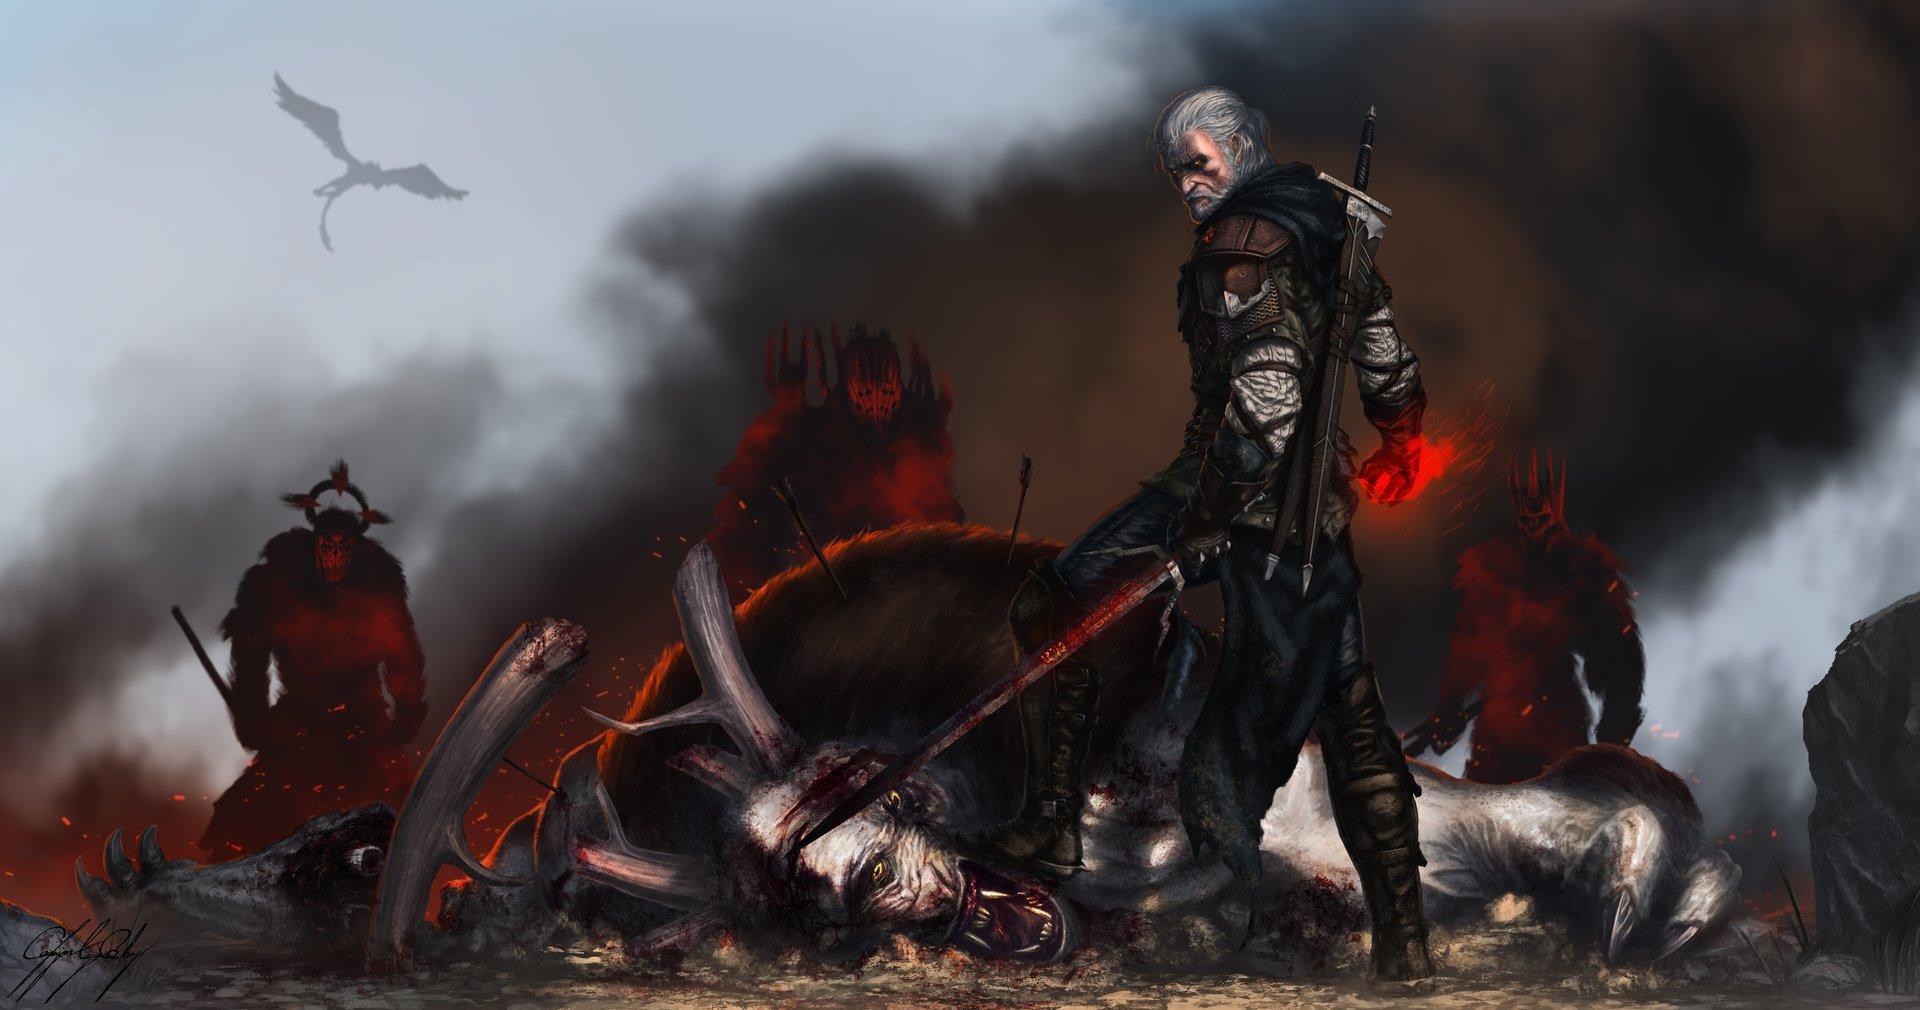 Геральт - Witcher 3: Wild Hunt, the Бес